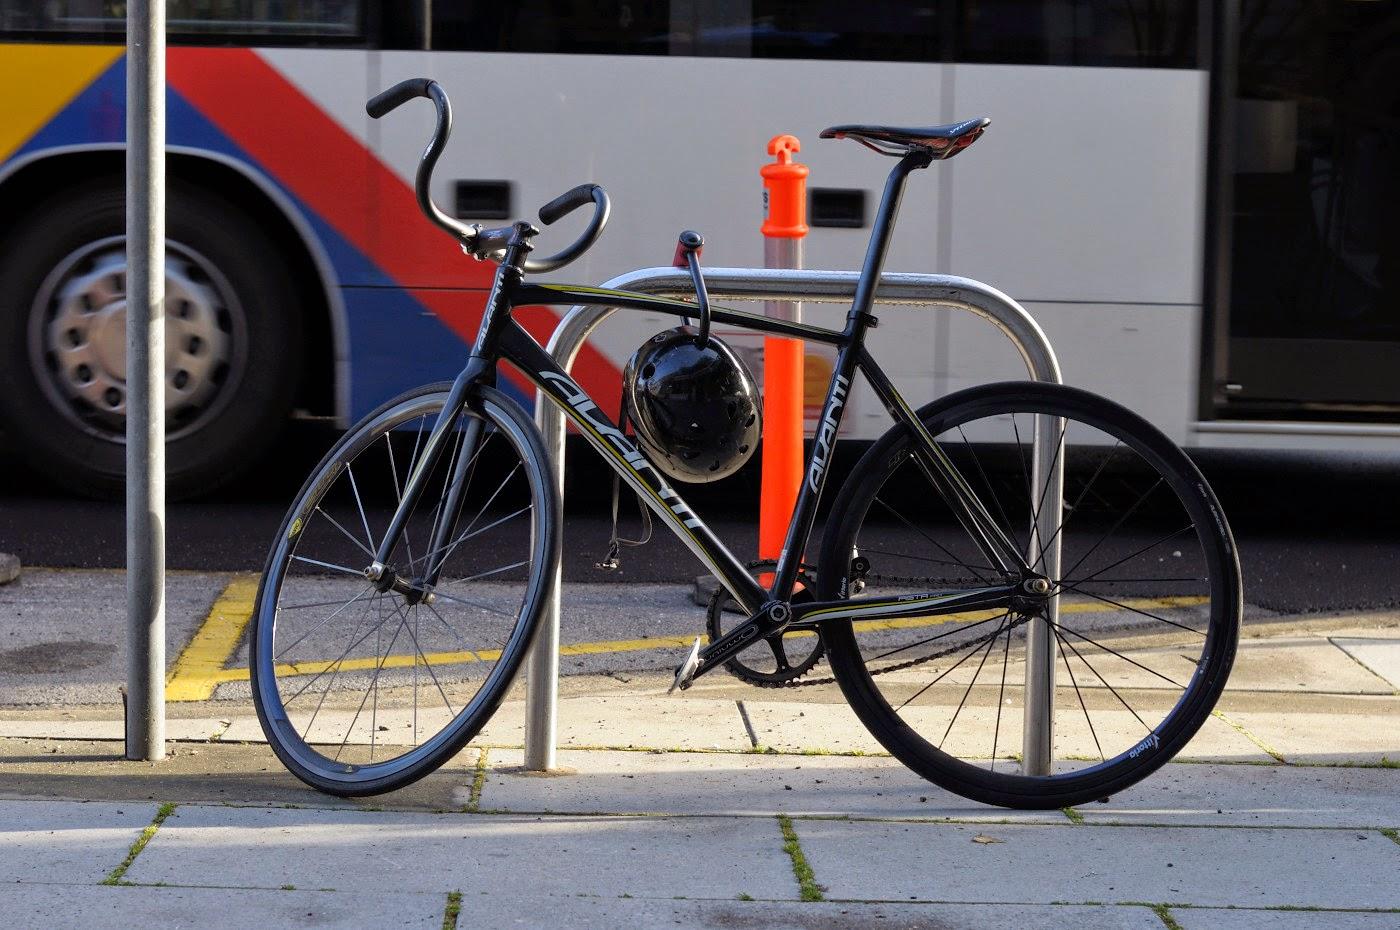 avanti, track, frame, pista pro, bespoke, fixie, bicycle, the biketorialist, tim Macauley, custom, customised, north terrace, Adelaide, blog, bike, fixed speed, shimano, mavic, fsa